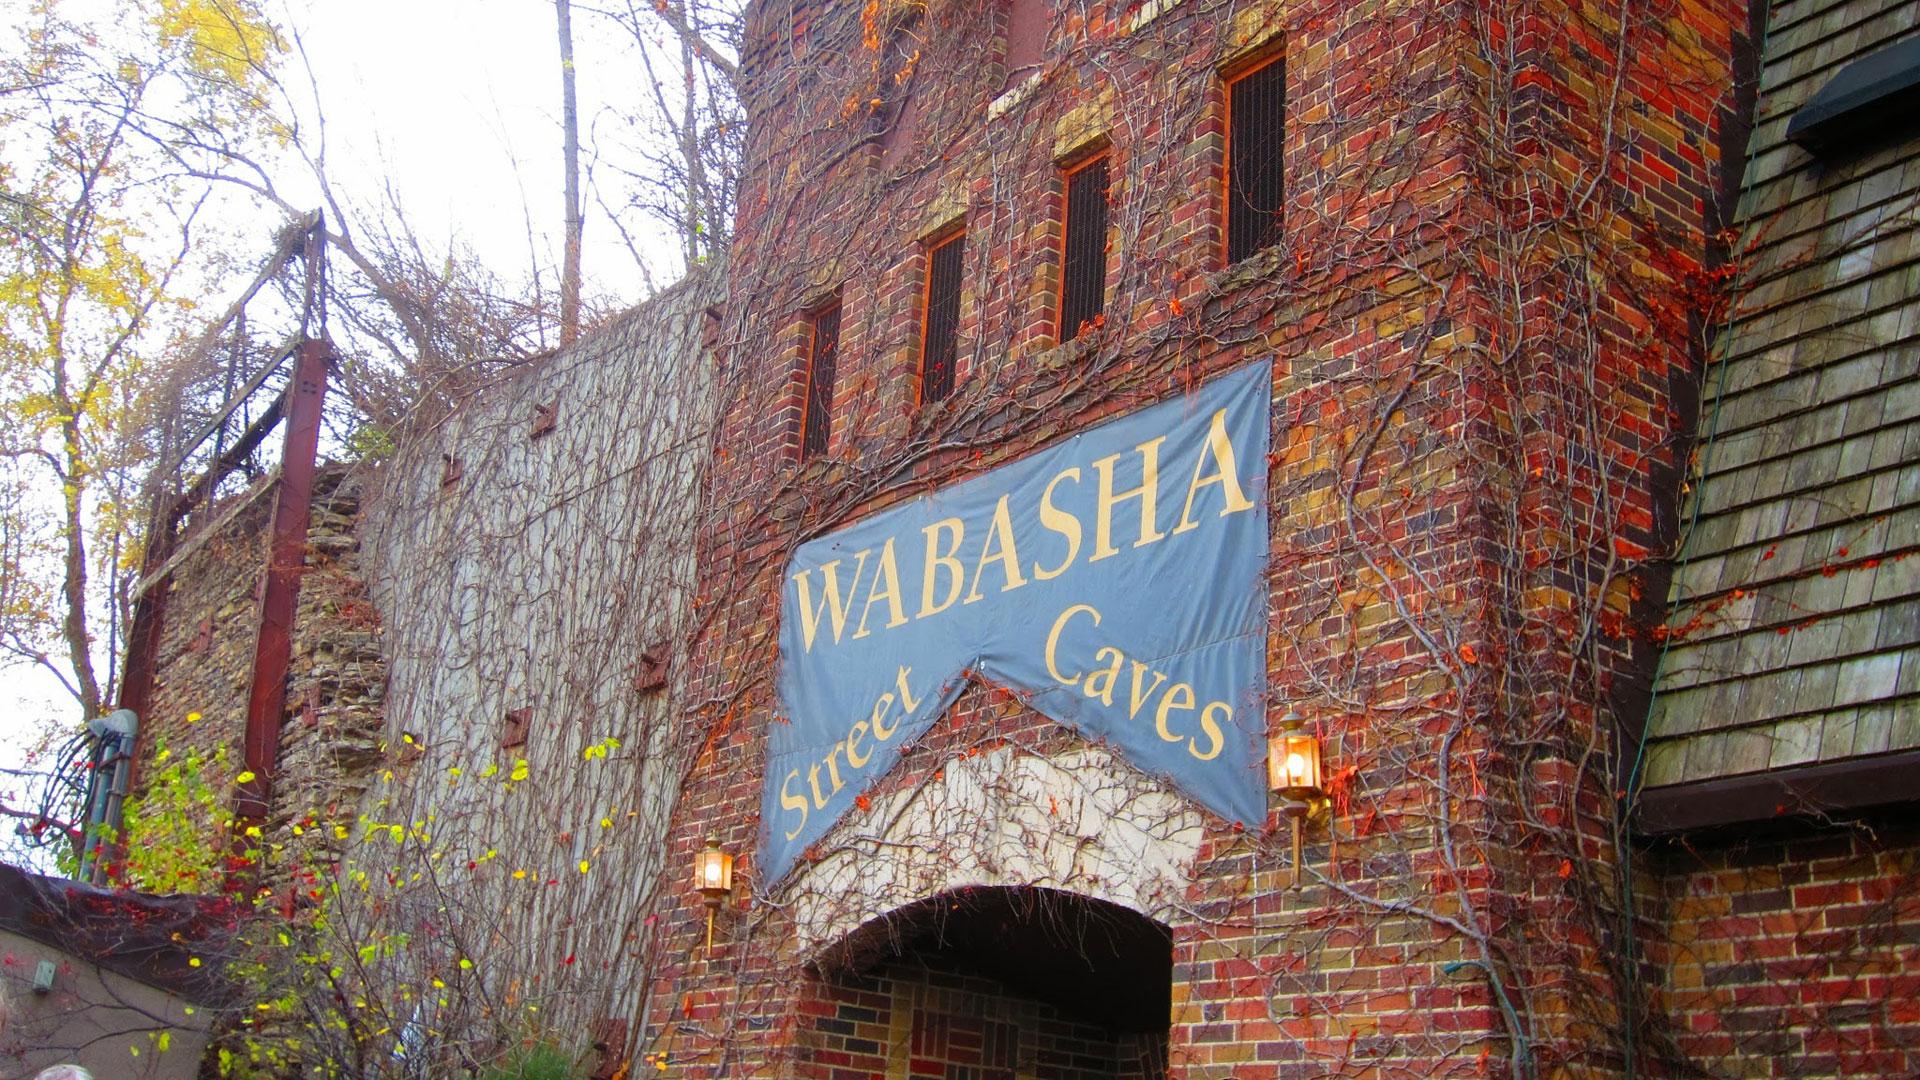 Wabasha Street Caves Historic Cave Tours